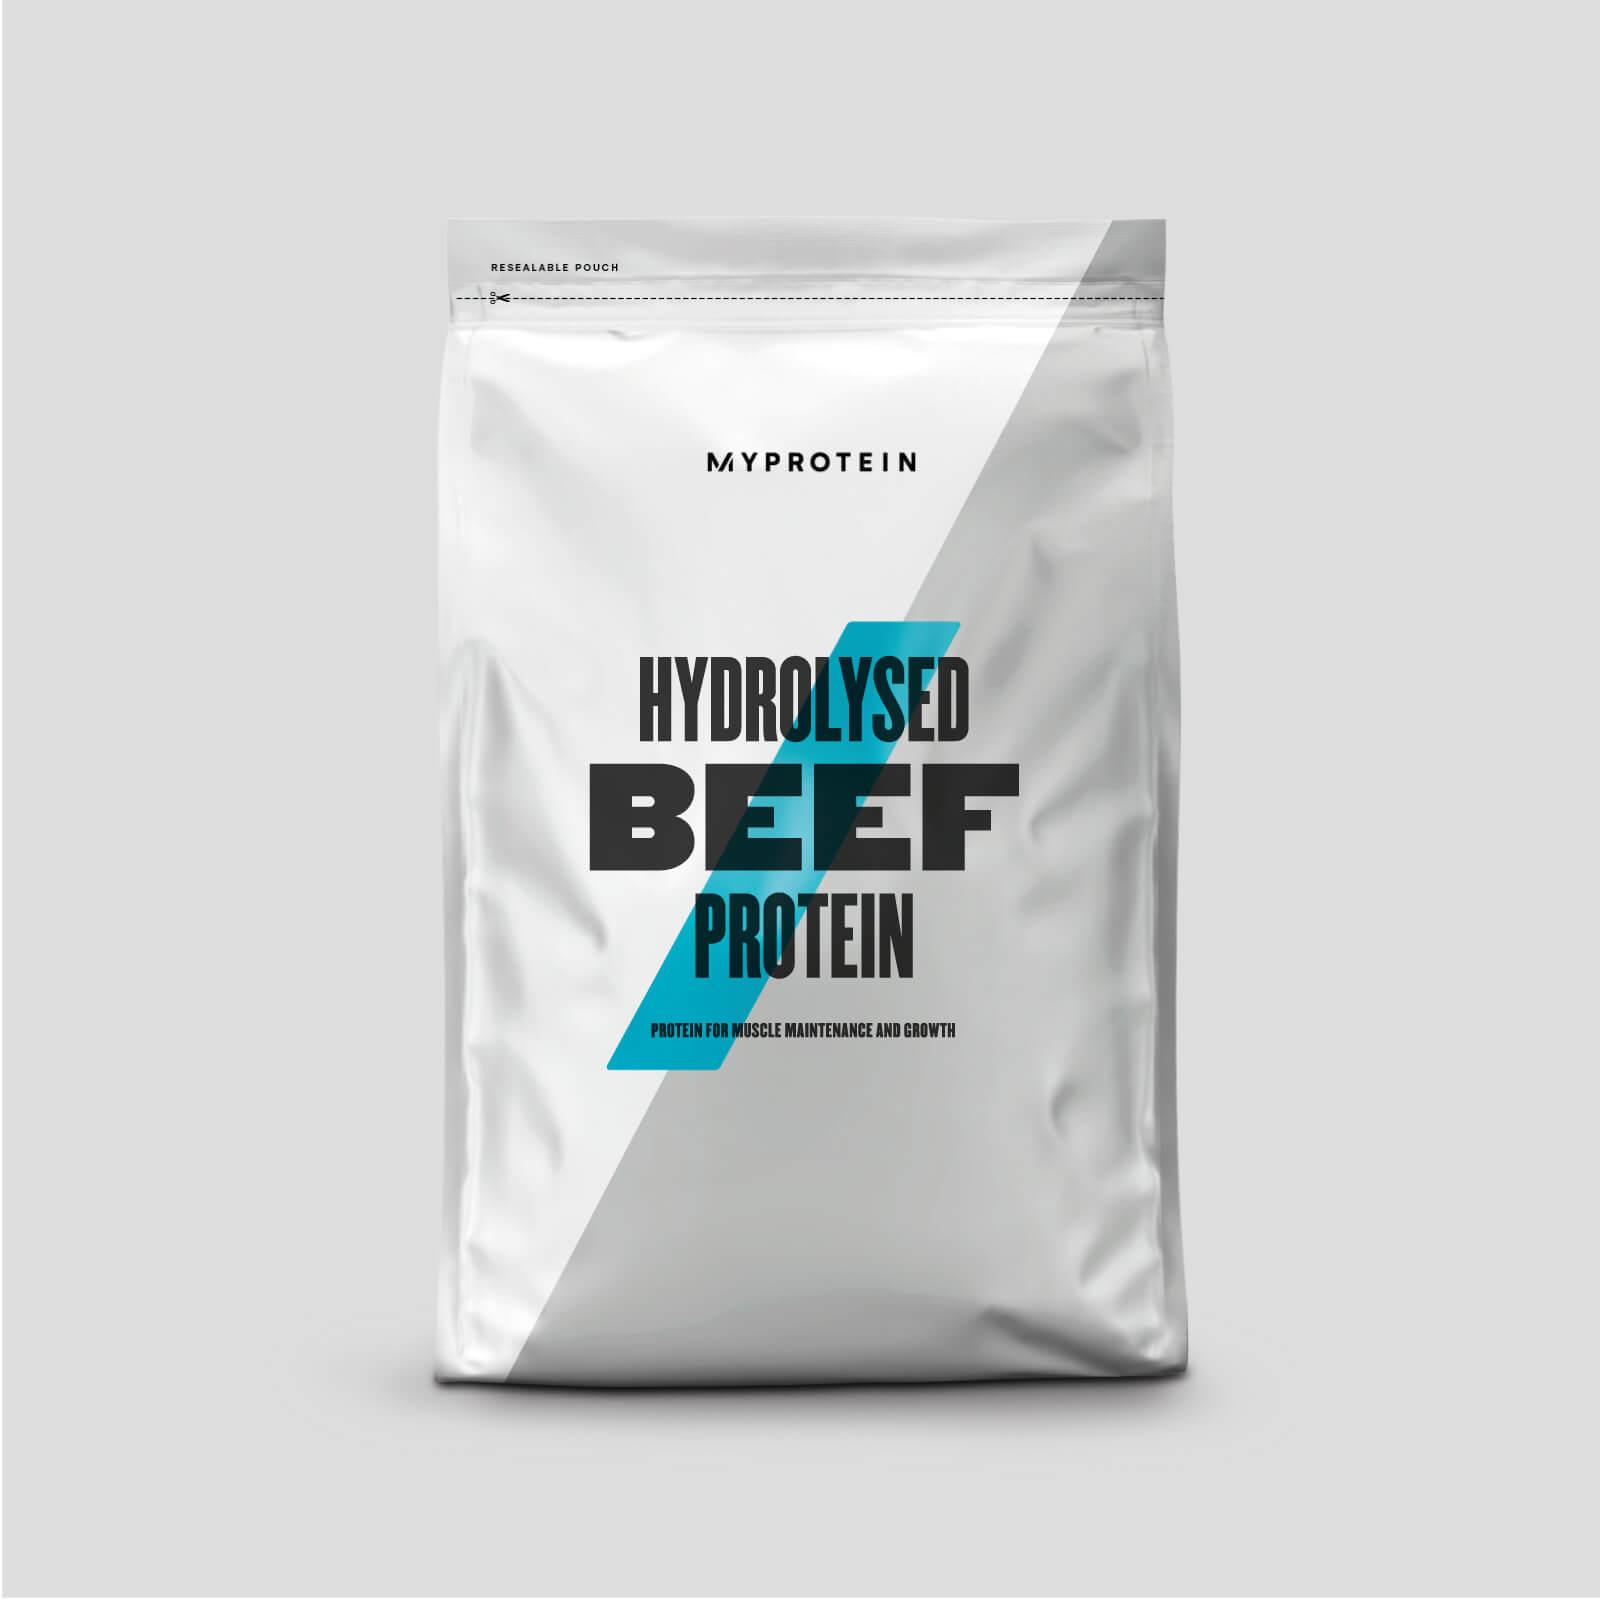 Myprotein Protéine de bœuf hydrolysée - 2500g - Chocolat